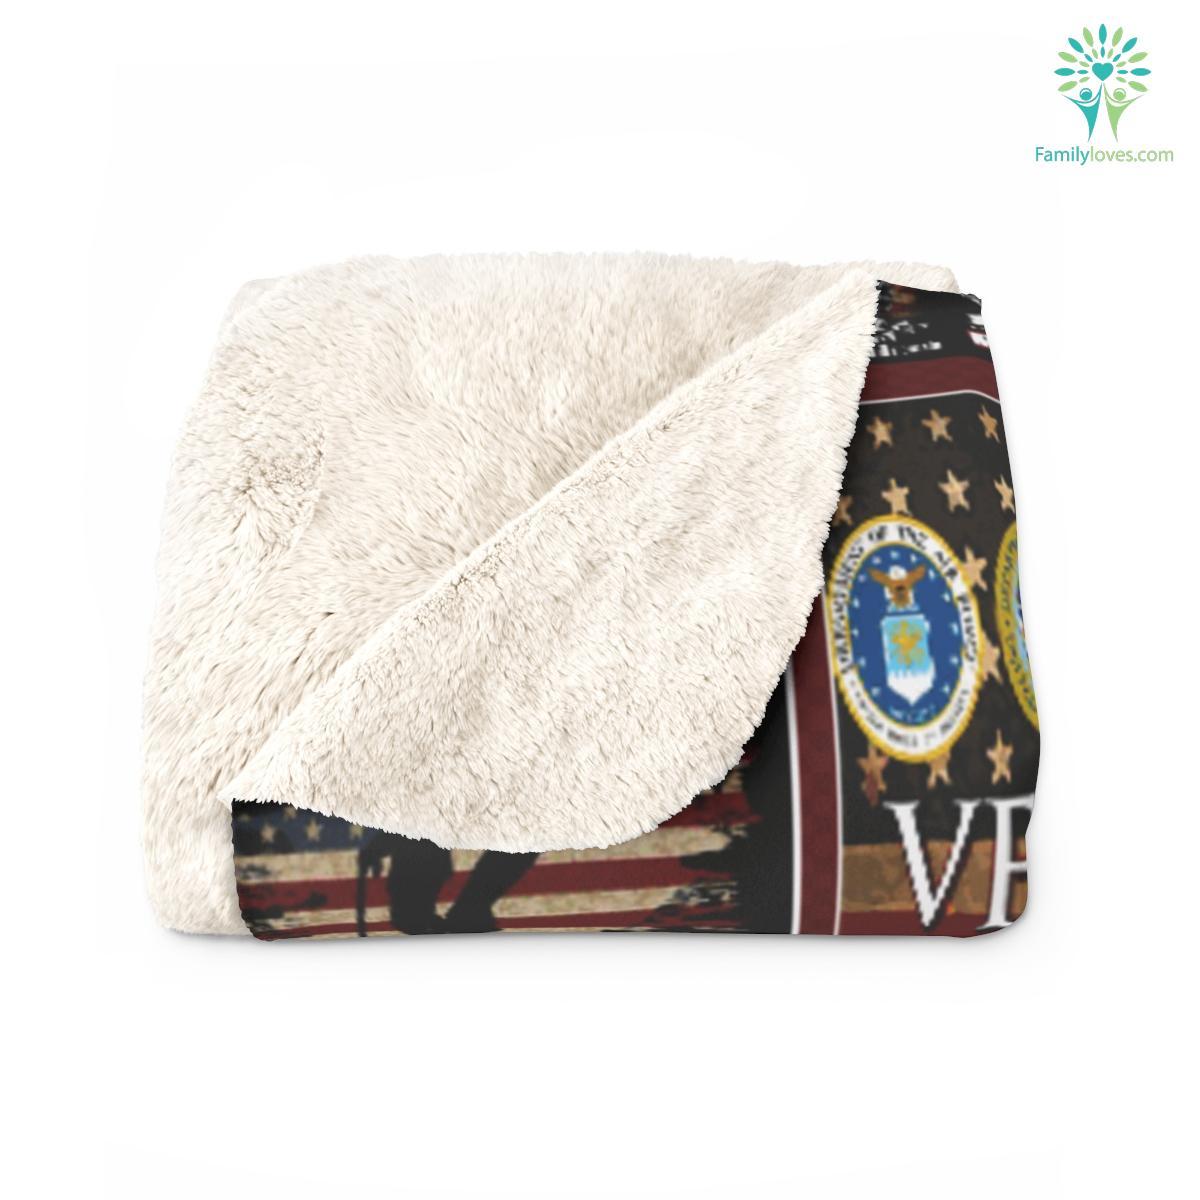 Gift ideas for veterans day, I am a veteran dad Sherpa Fleece Blanket Familyloves.com